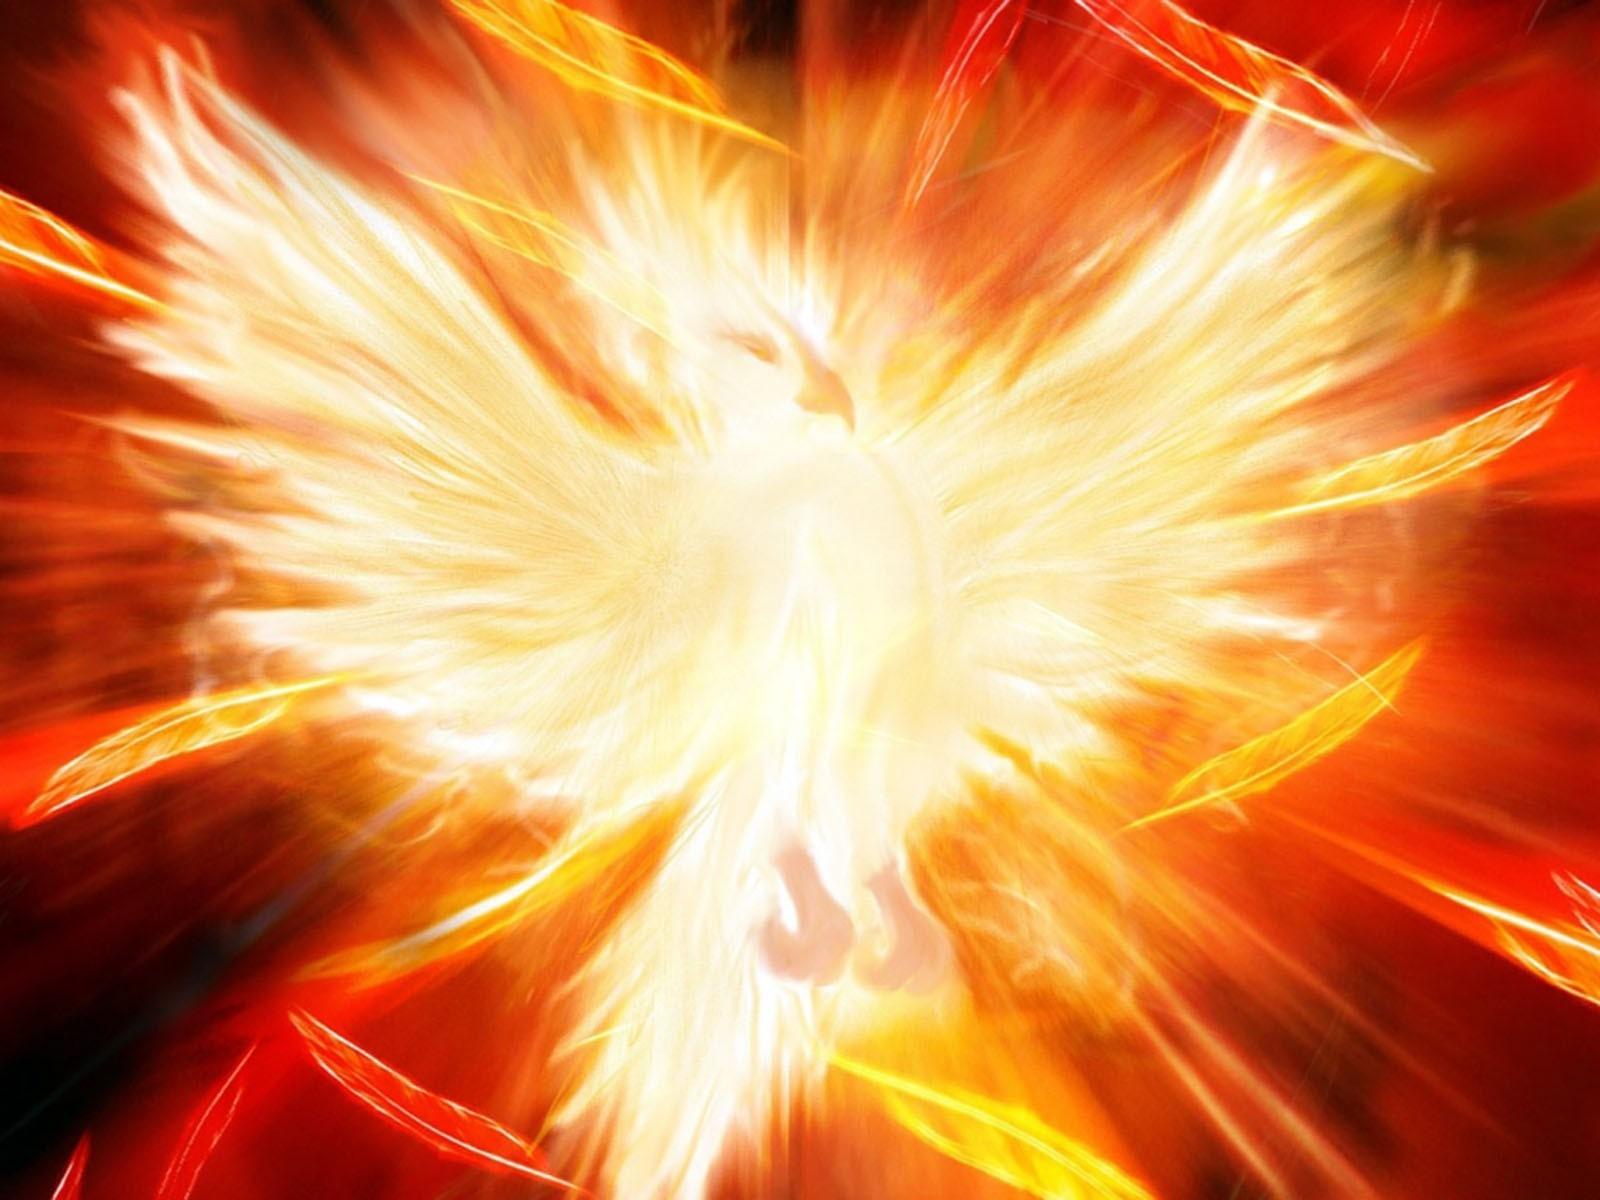 ♕ SPIRIT BRINGERS: EMPYREAN REALM. (SAGA DE BYNQUISTERR) - Página 21 Birds_fire_phoenix-139007